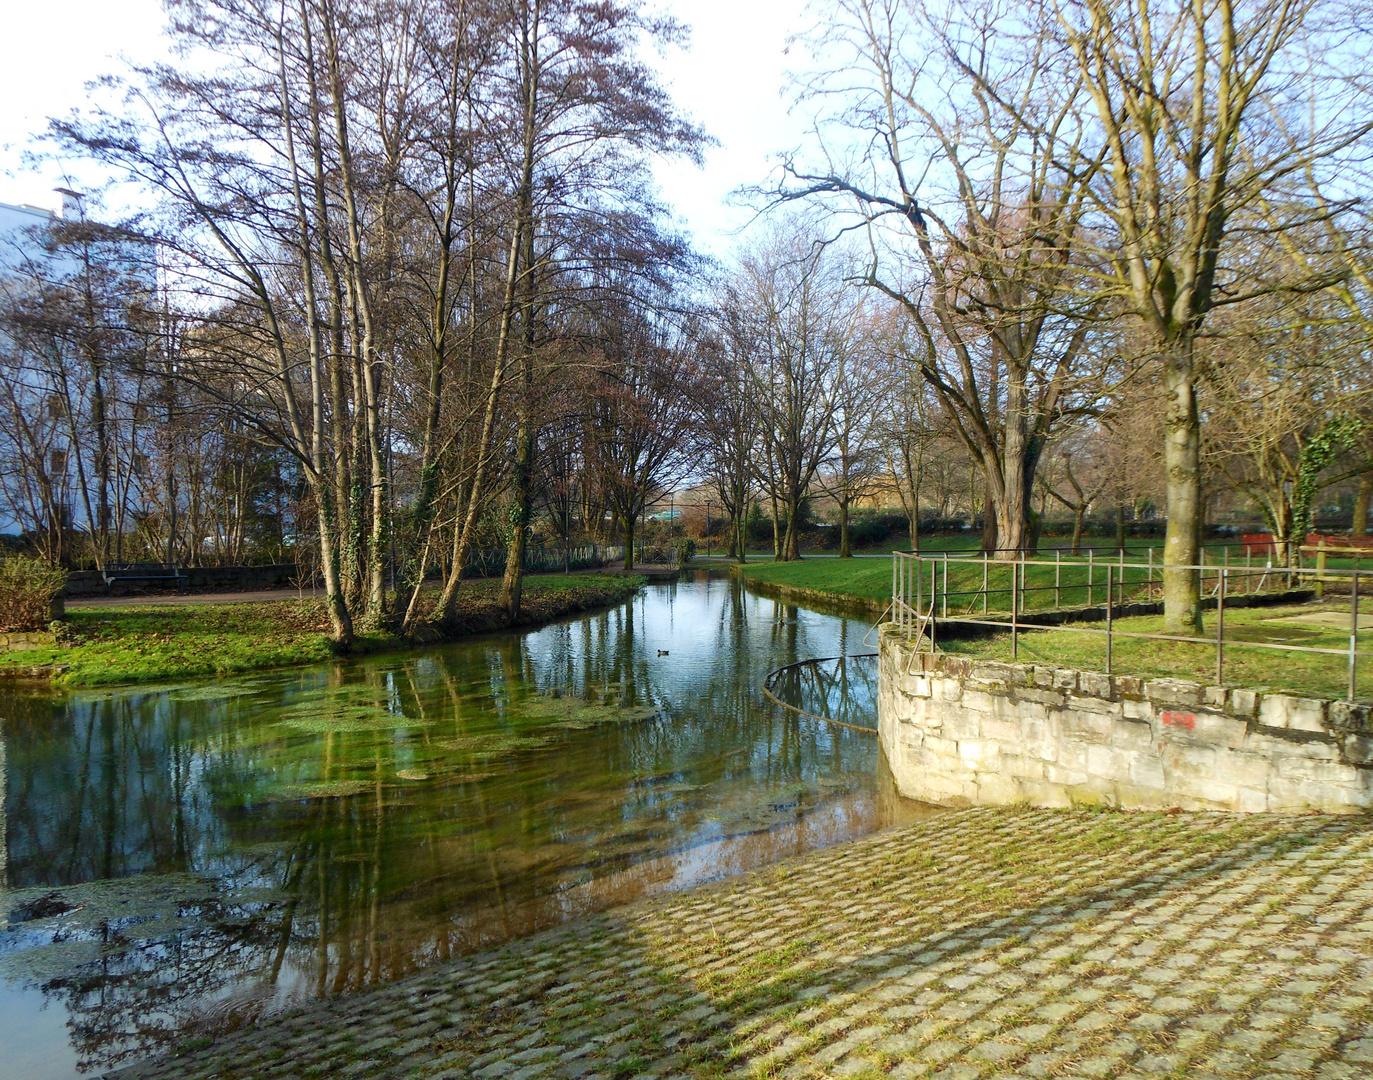 Paderborner quellgebiet